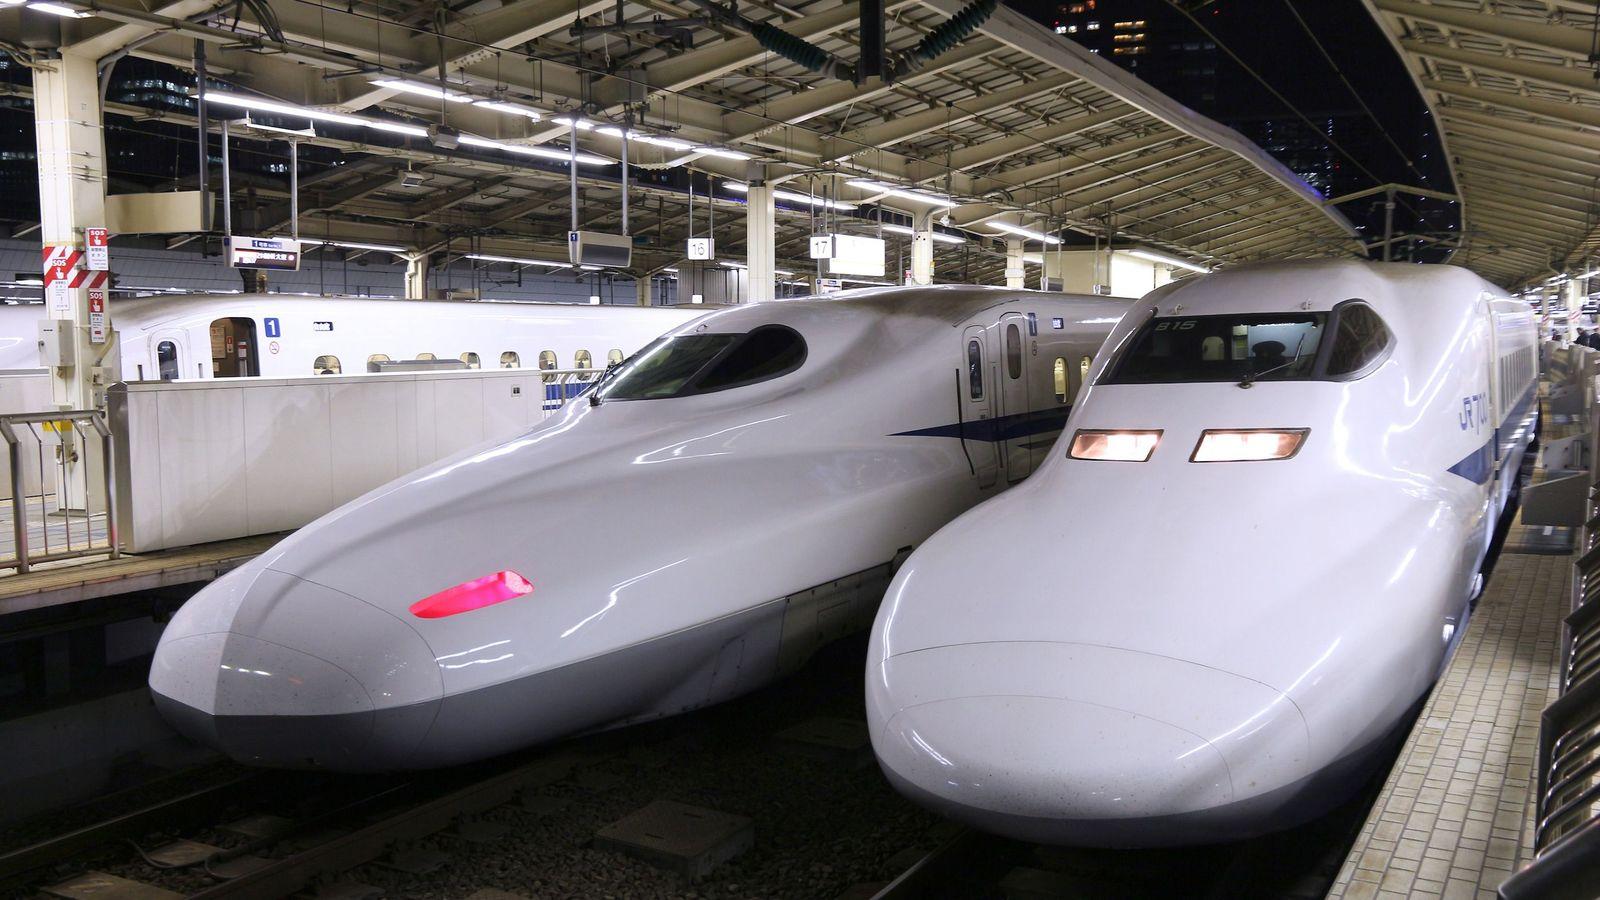 JR東海×JR九州「儲けの質」が根本的に違う訳 財務諸表に見る「戦略と志」の落差